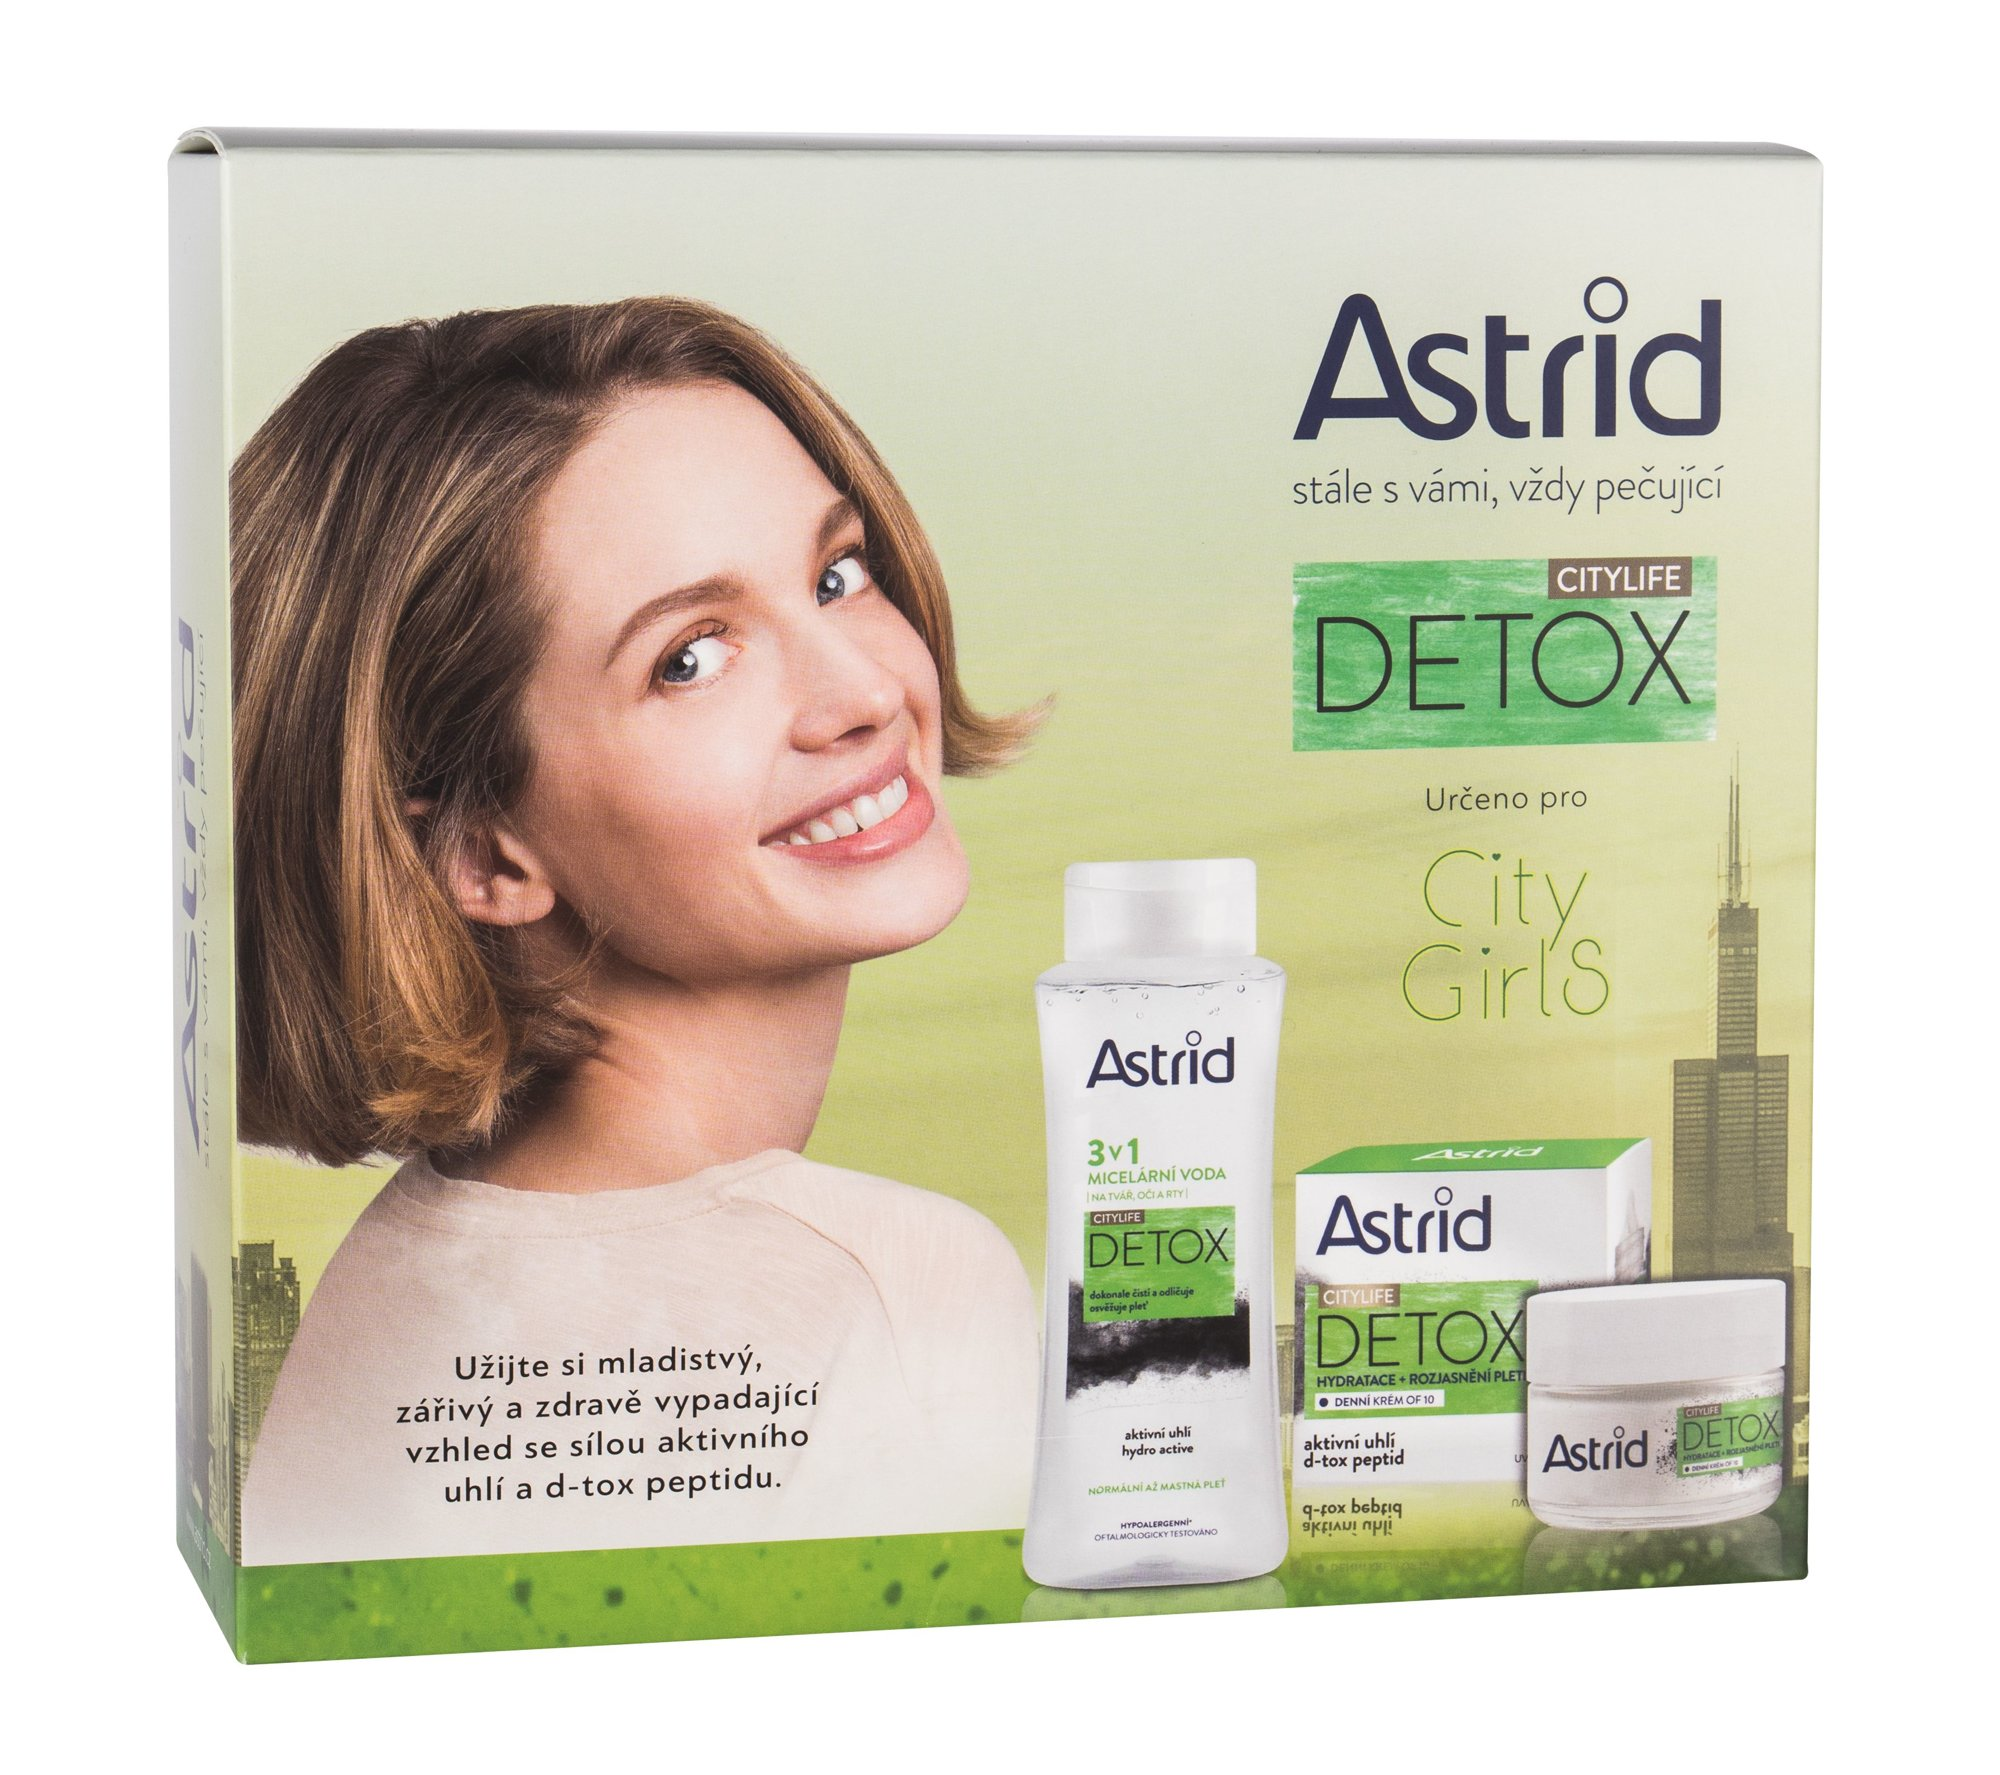 Astrid Citylife Detox Day Cream 50ml